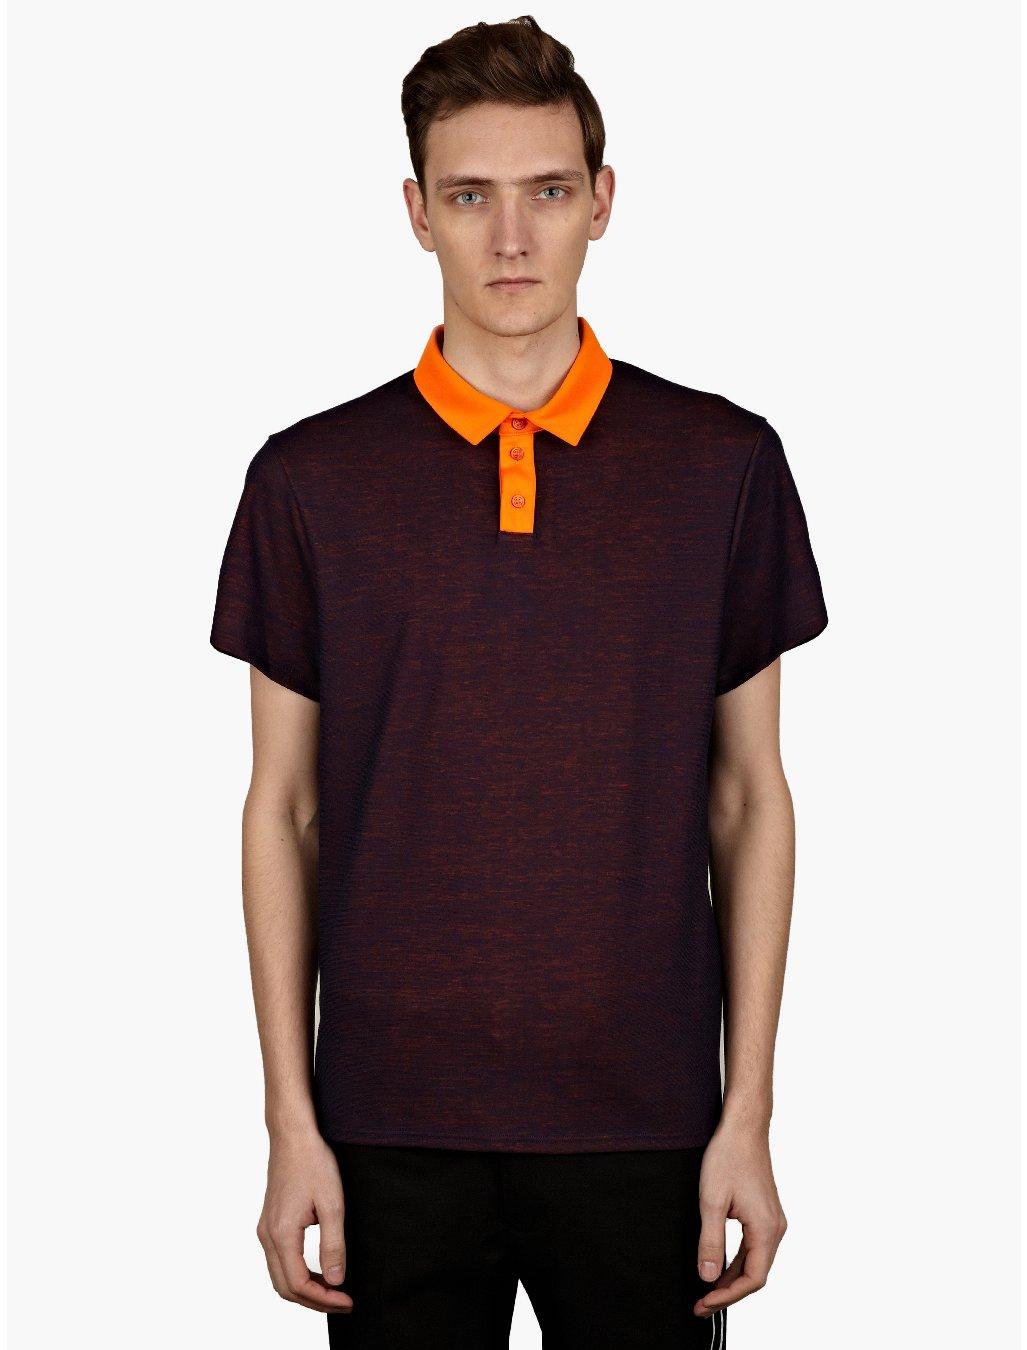 Jil sander mens navy blue contrast collar polo shirt in for Jil sander mens shirt